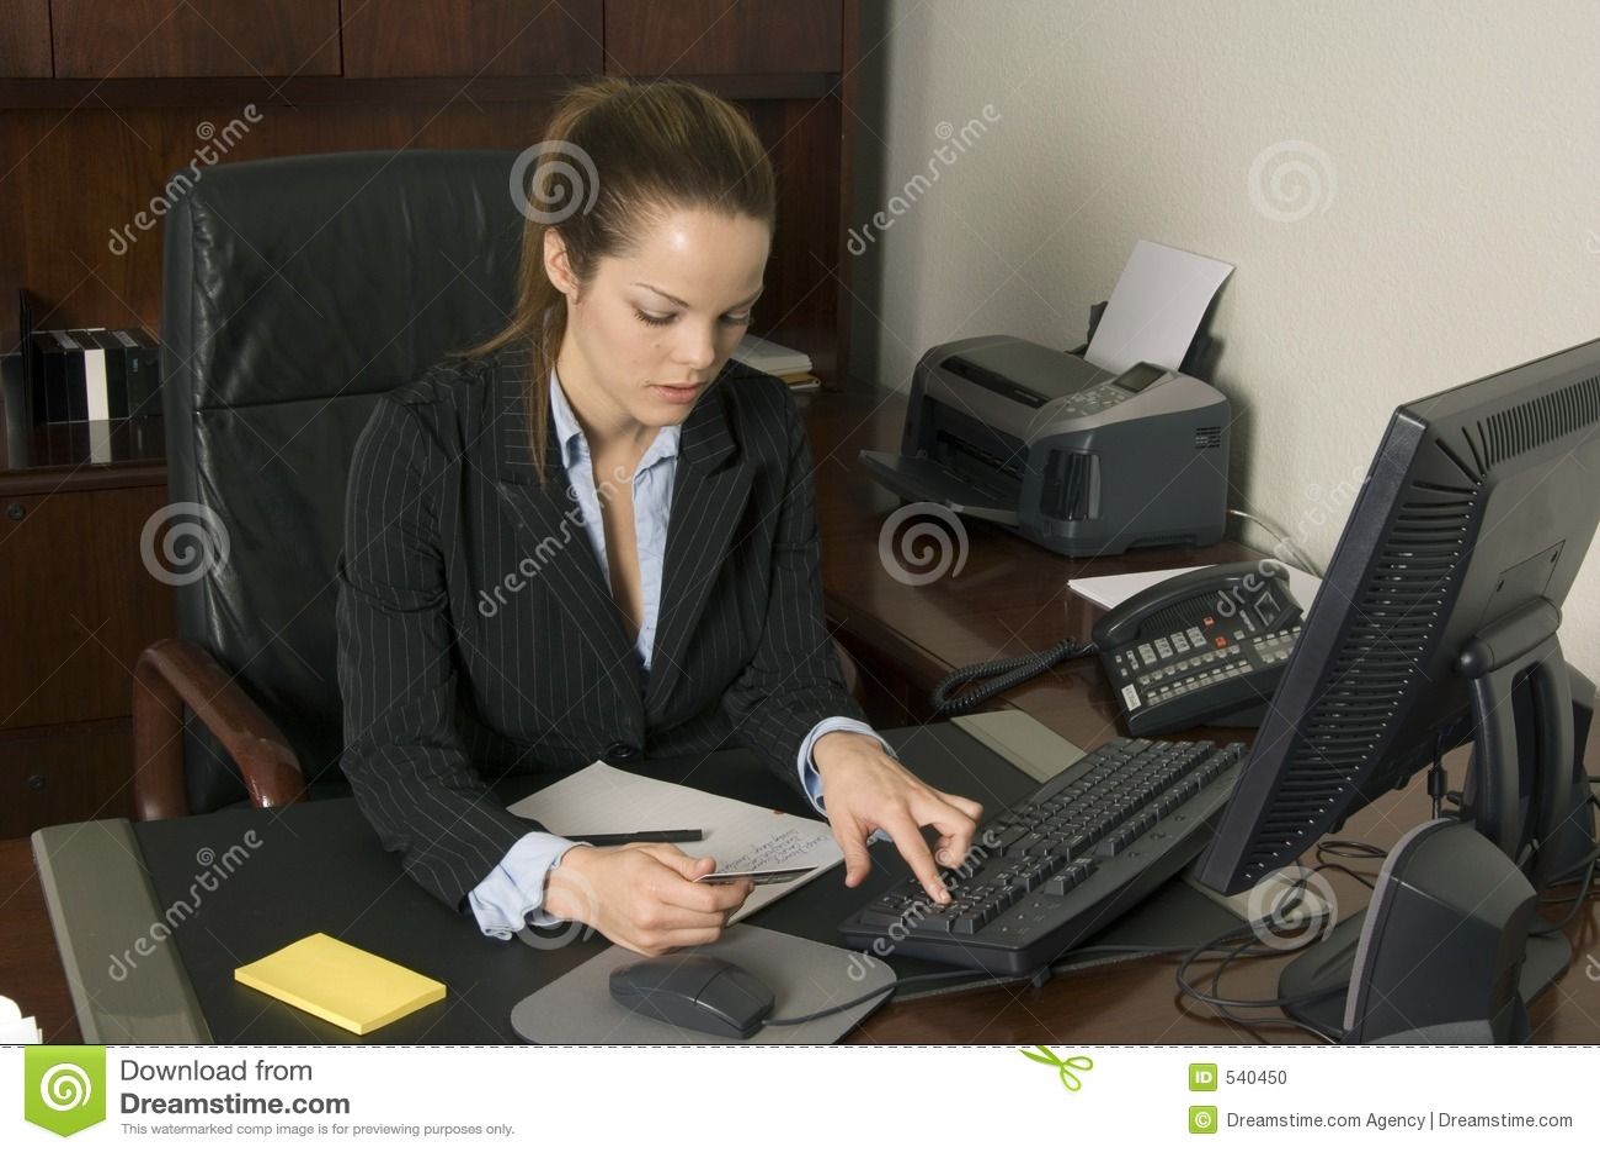 Download 在线购物 库存照片. 图片 包括有 货币, 电子, 执行委员, 夫人, 打印机, 互联网, 看板卡, 结算离开 - 540450